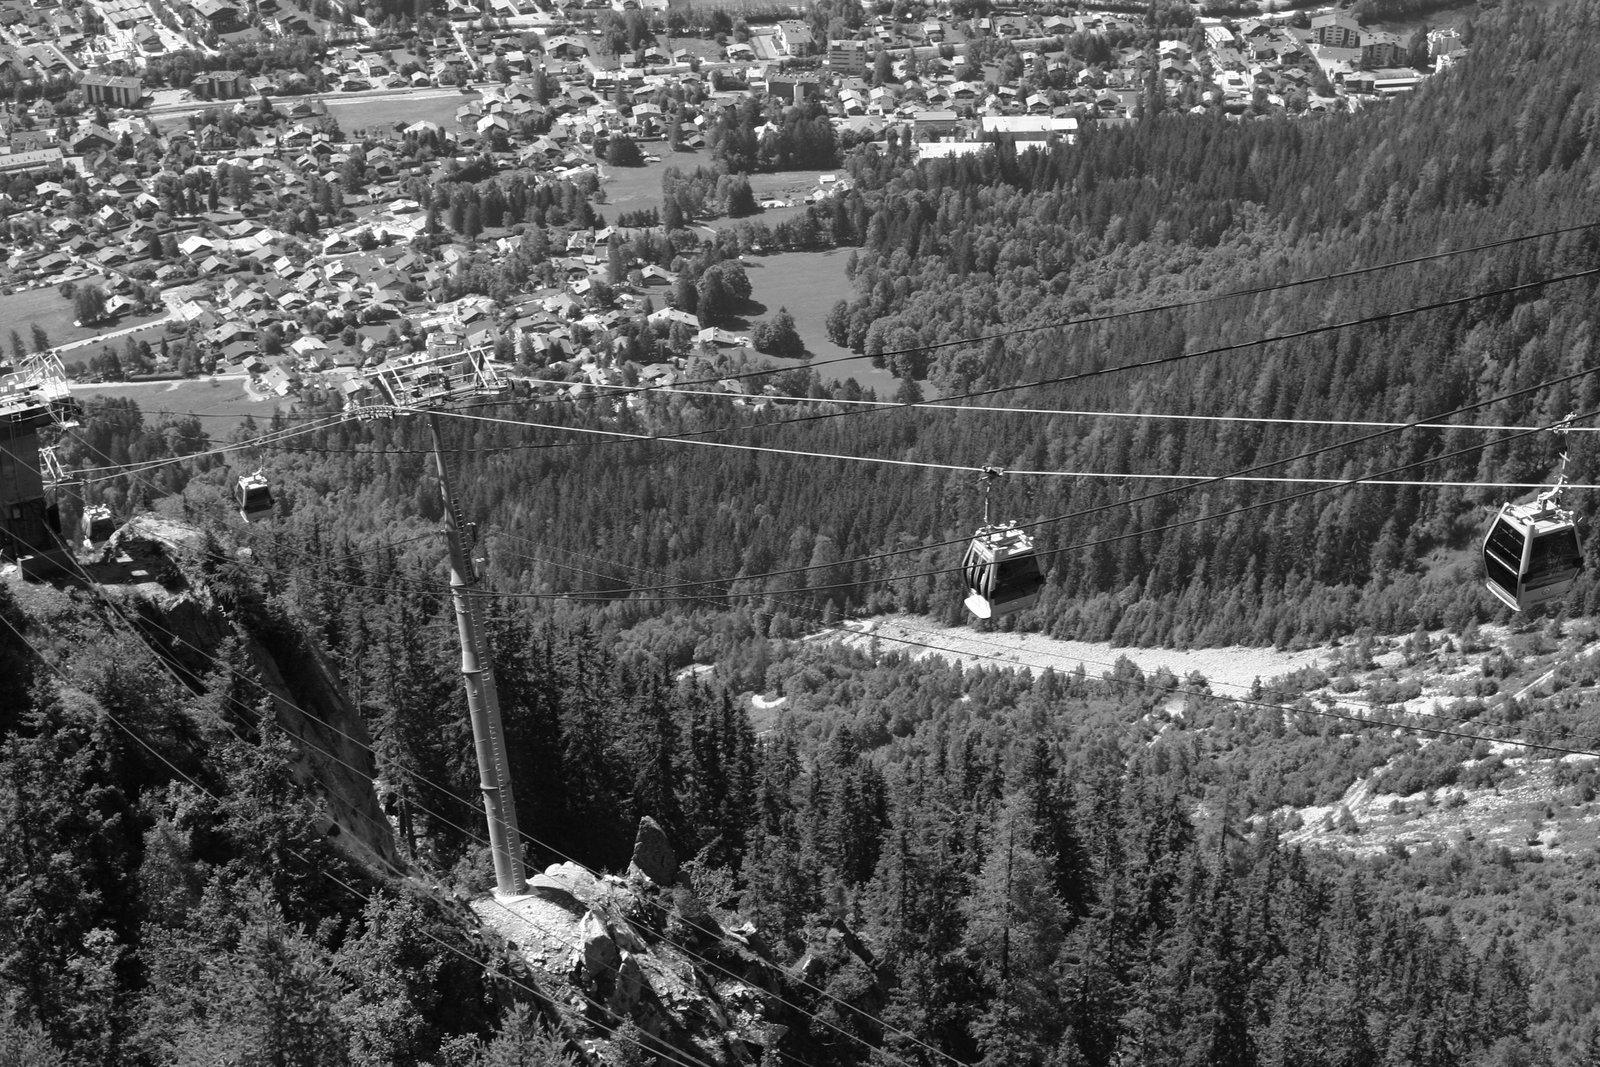 Chamonix tram